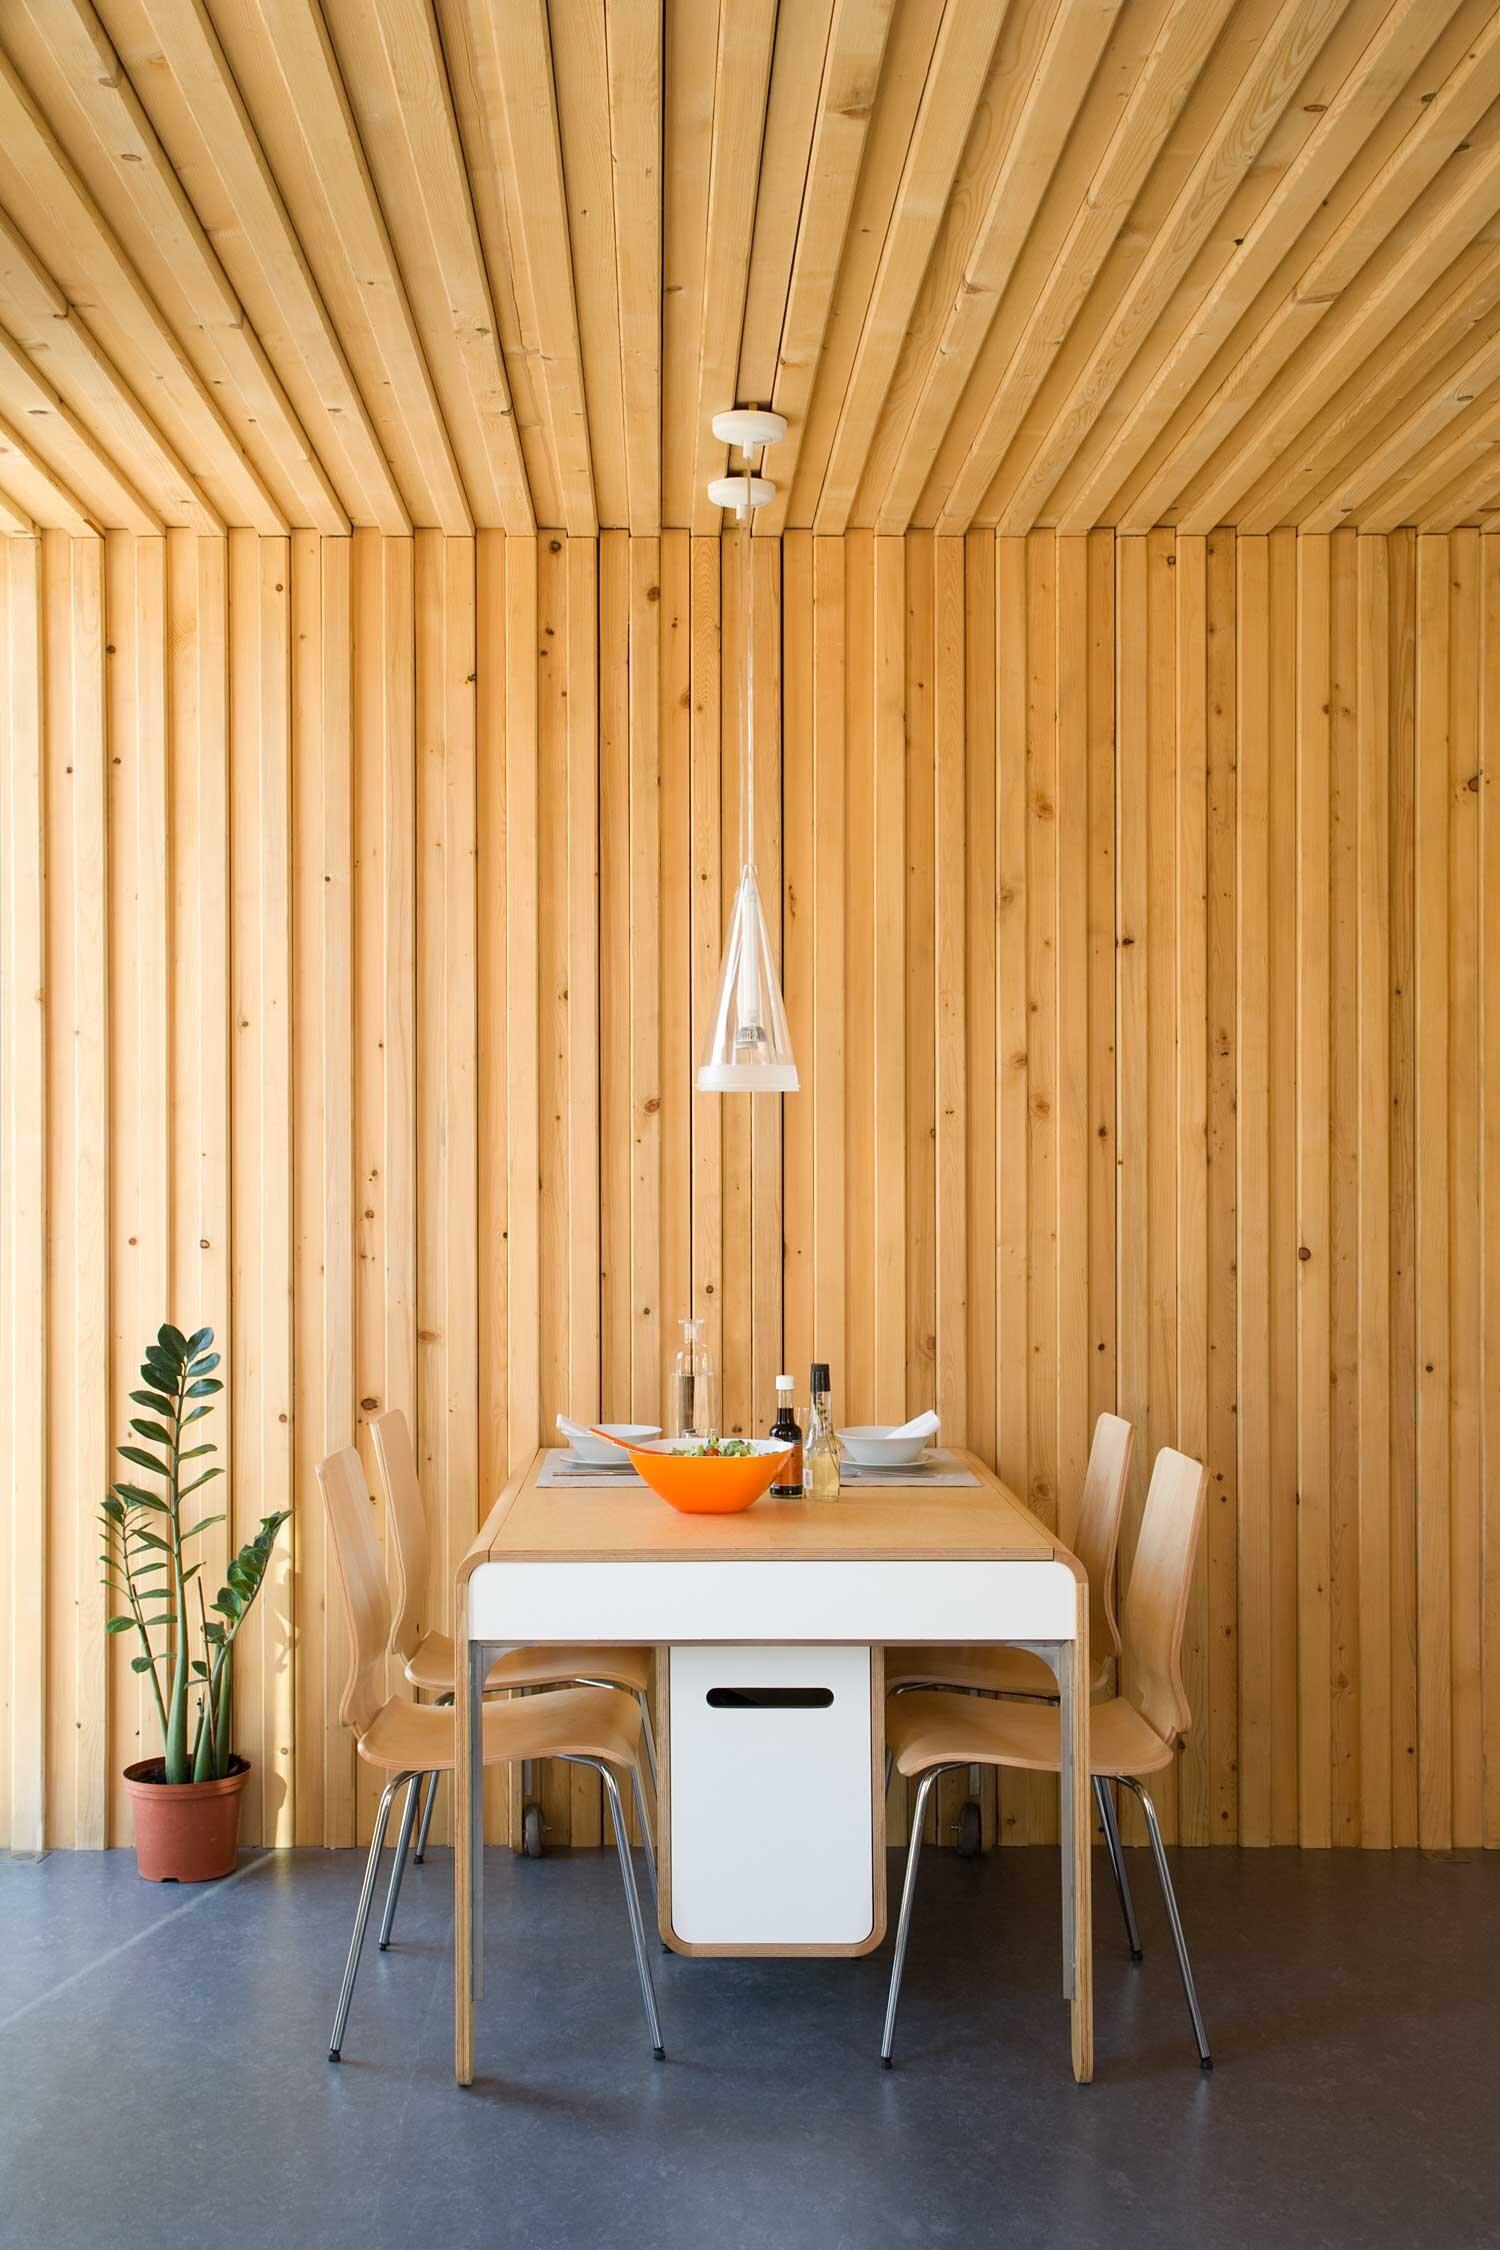 Studio Go - Tiny House - Noem - Barcelona - Dining Area - Humble Homes